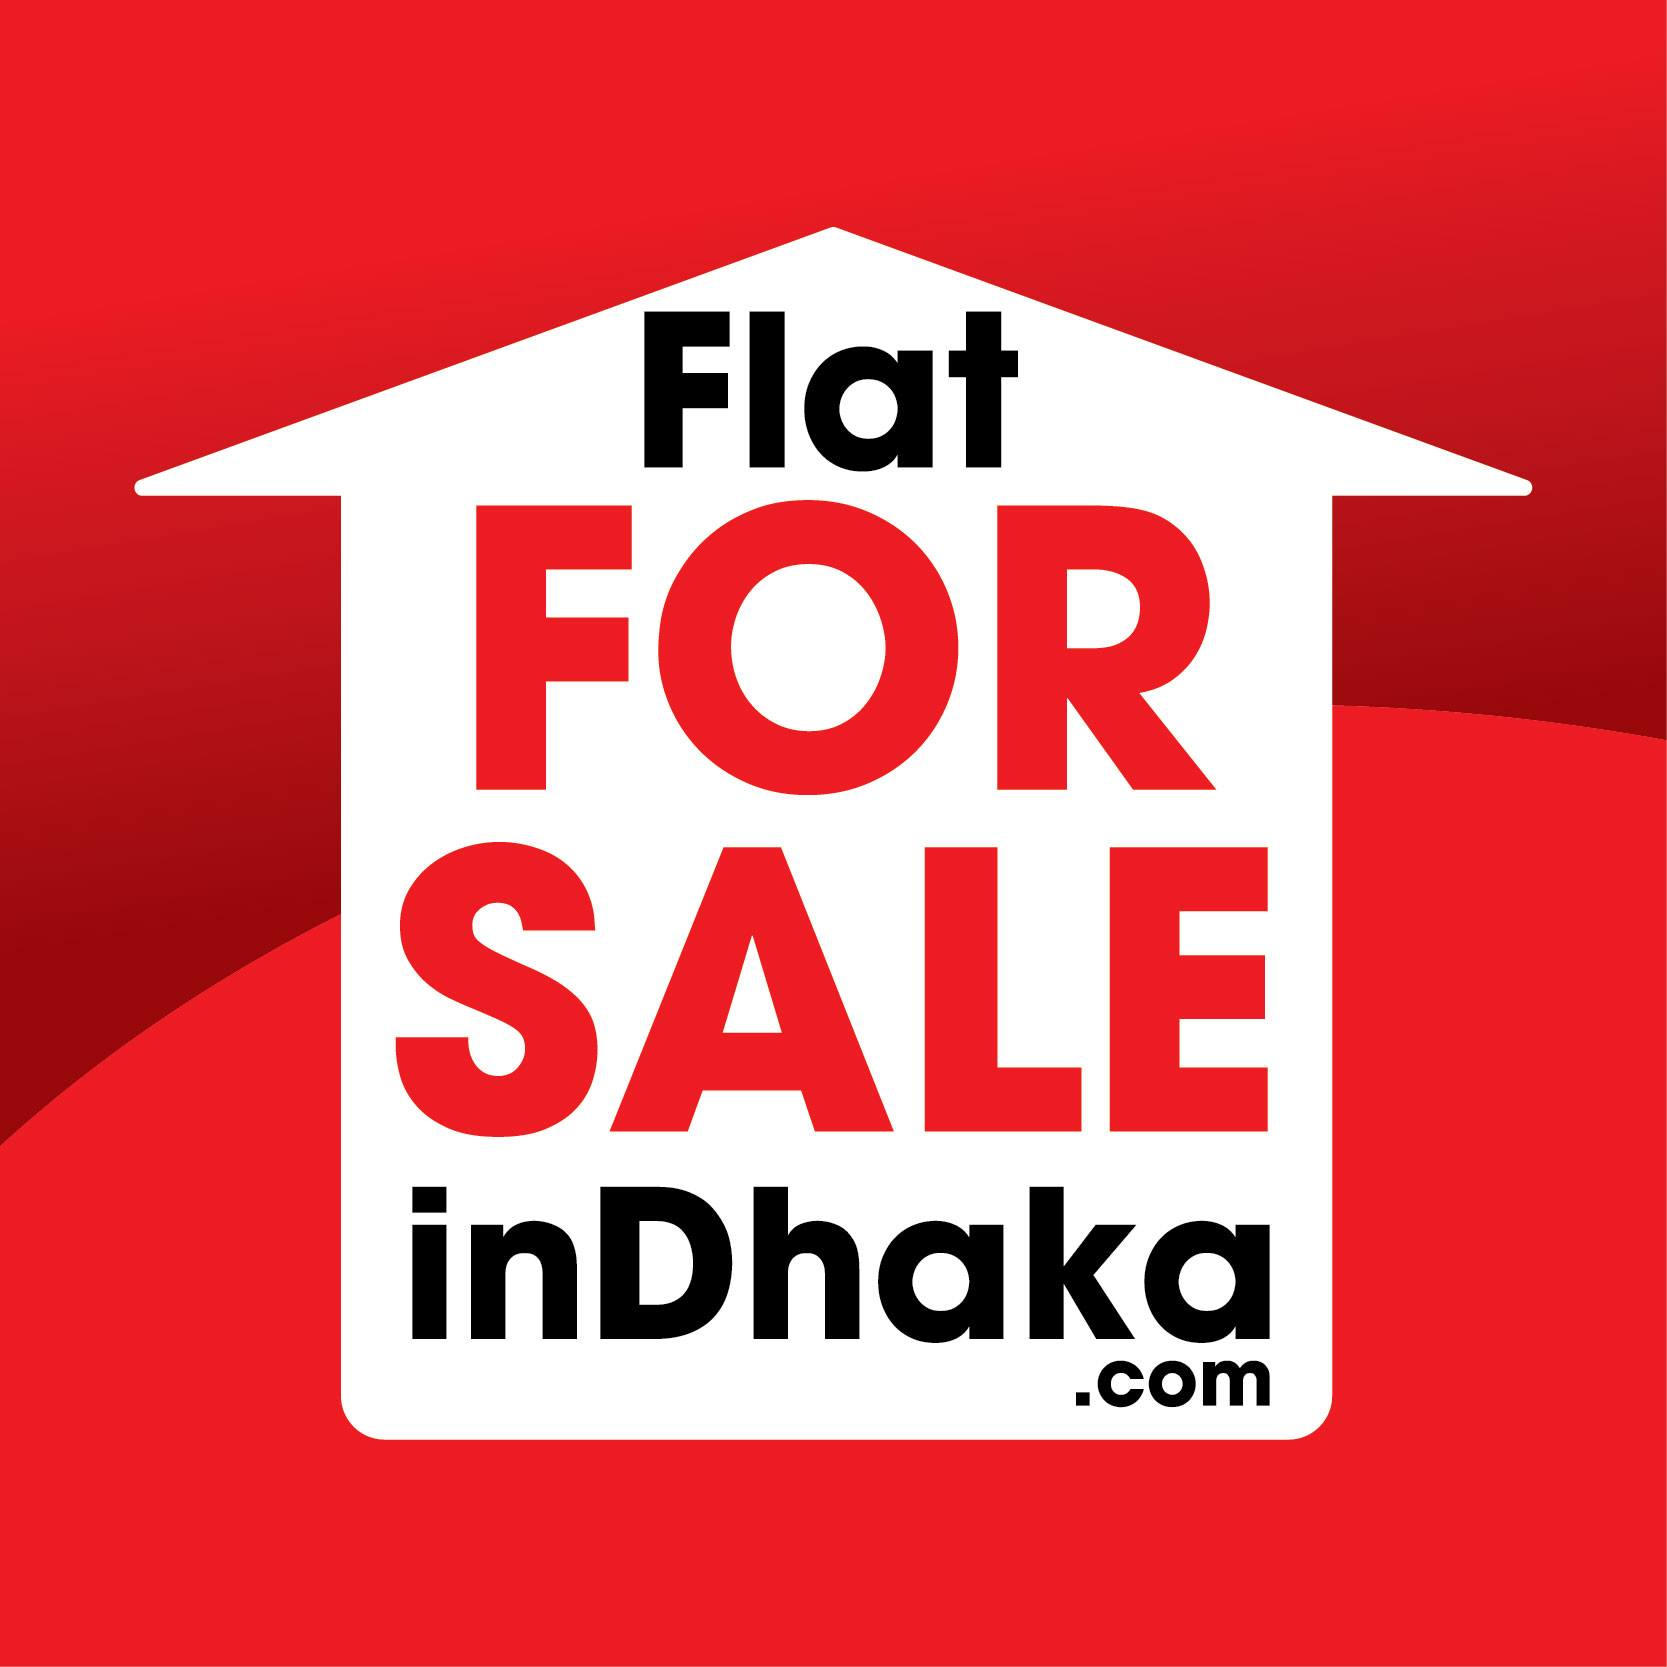 flatforsaleindhaka.com